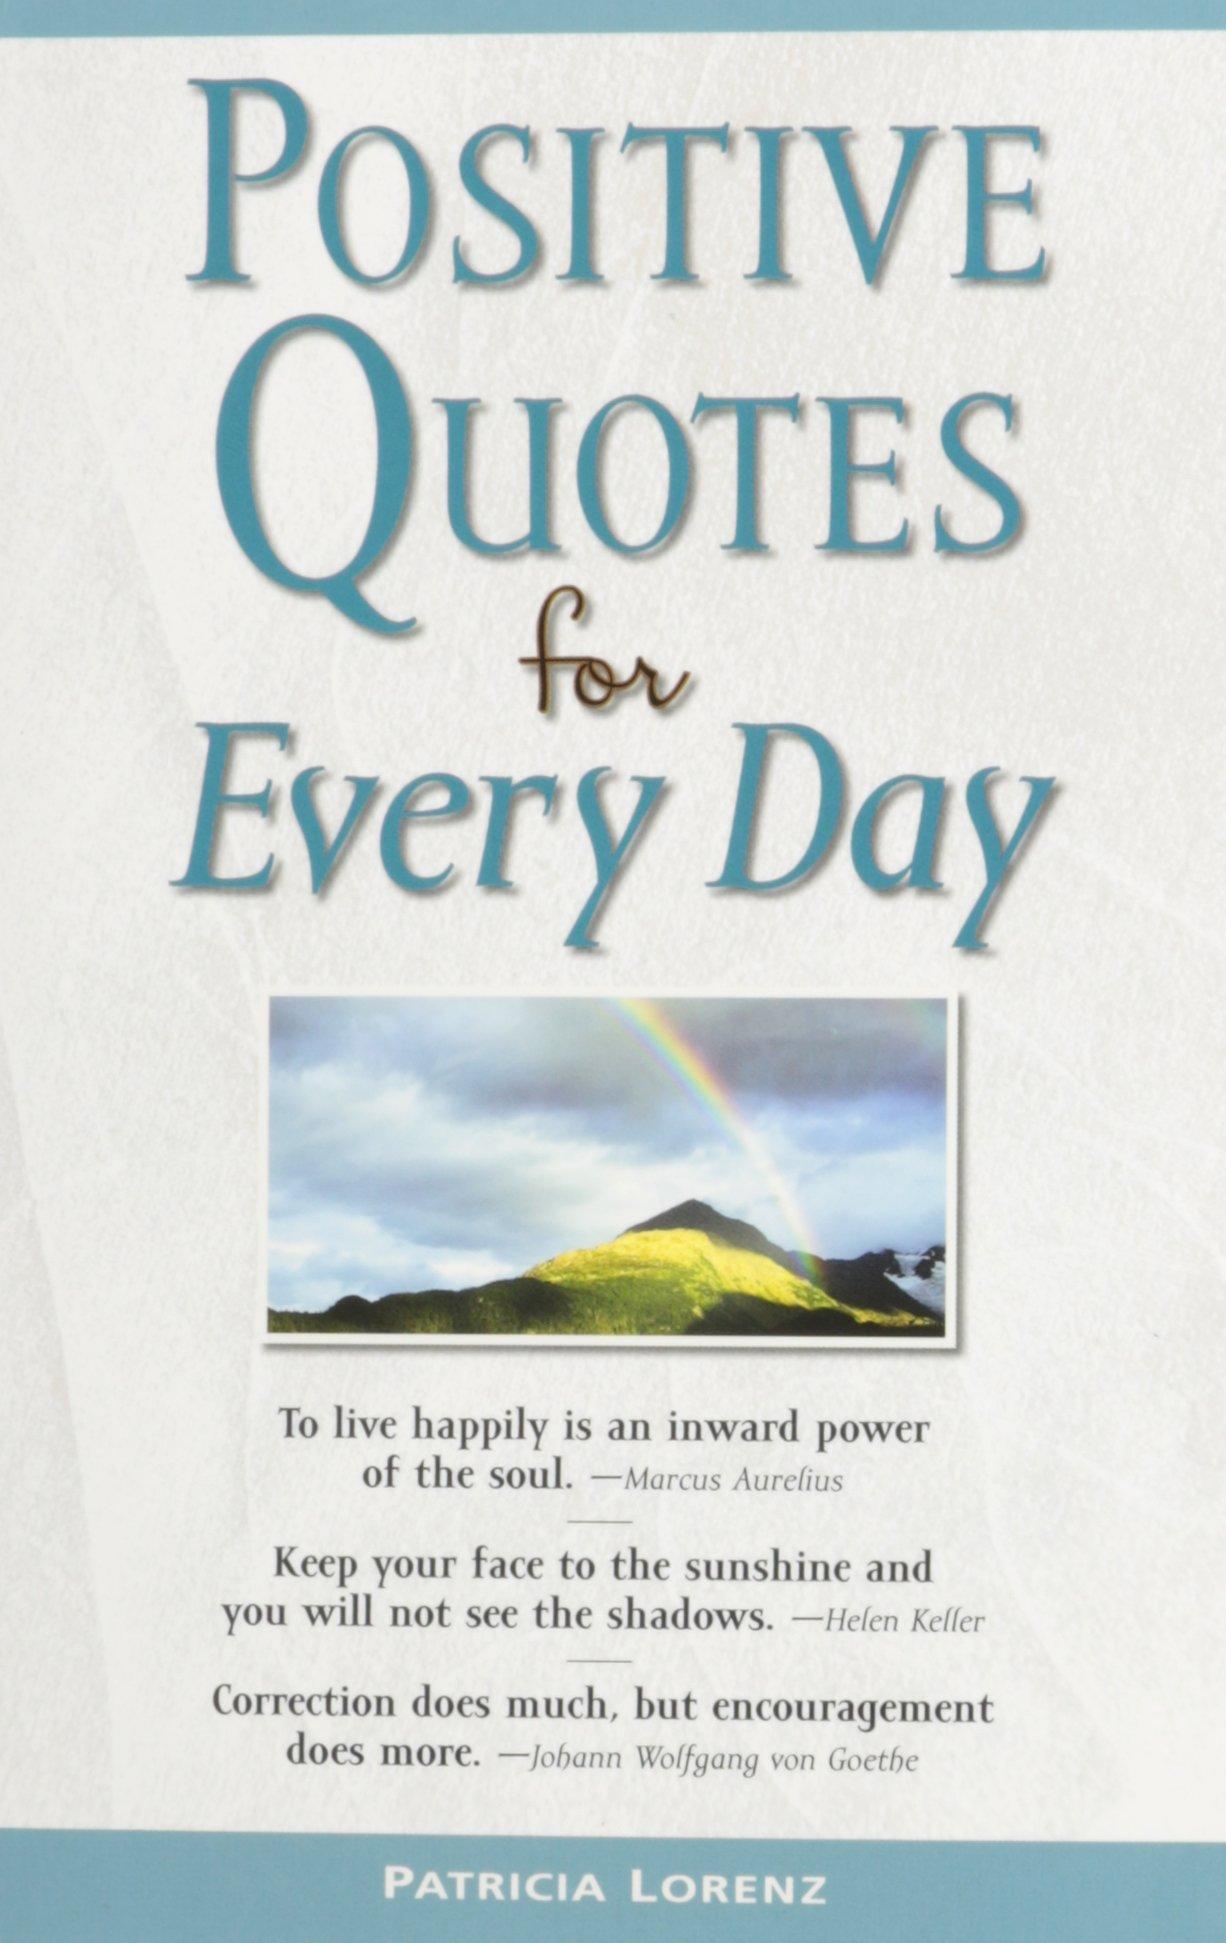 Positive Quotes For Everyday Publications International Ltd 9781450802925 Amazon Com Books